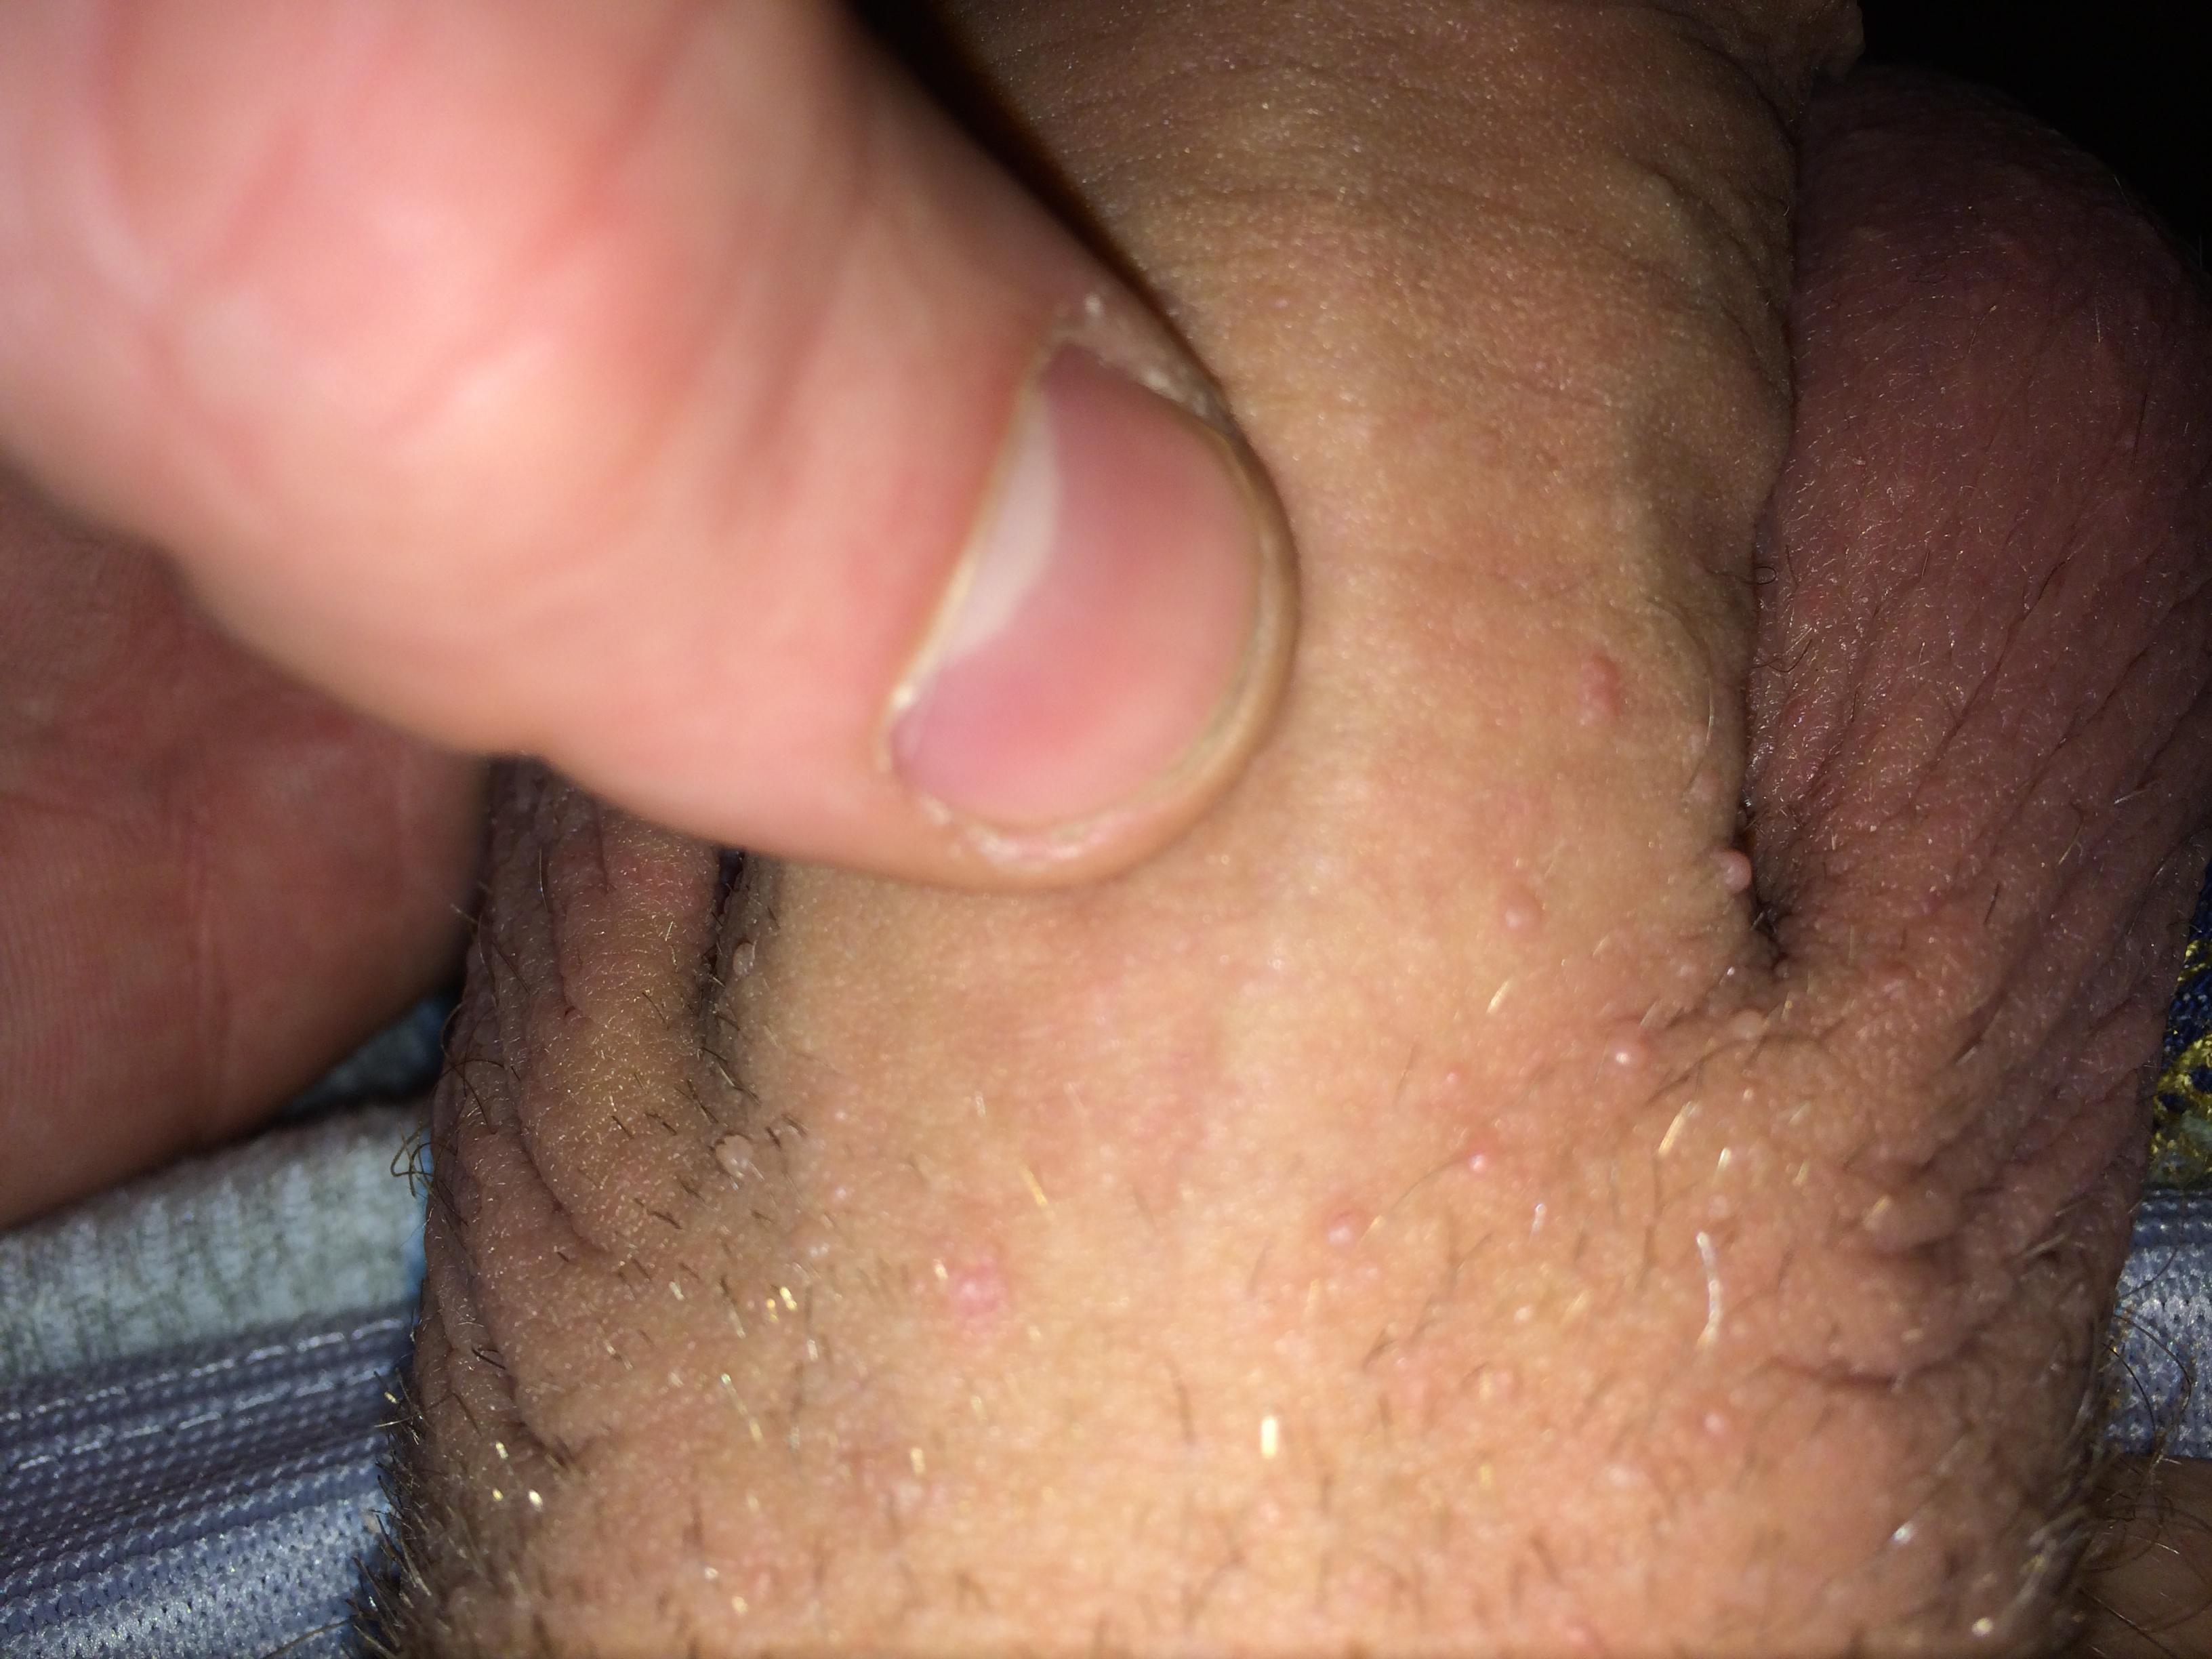 Sexy poses holding vagina